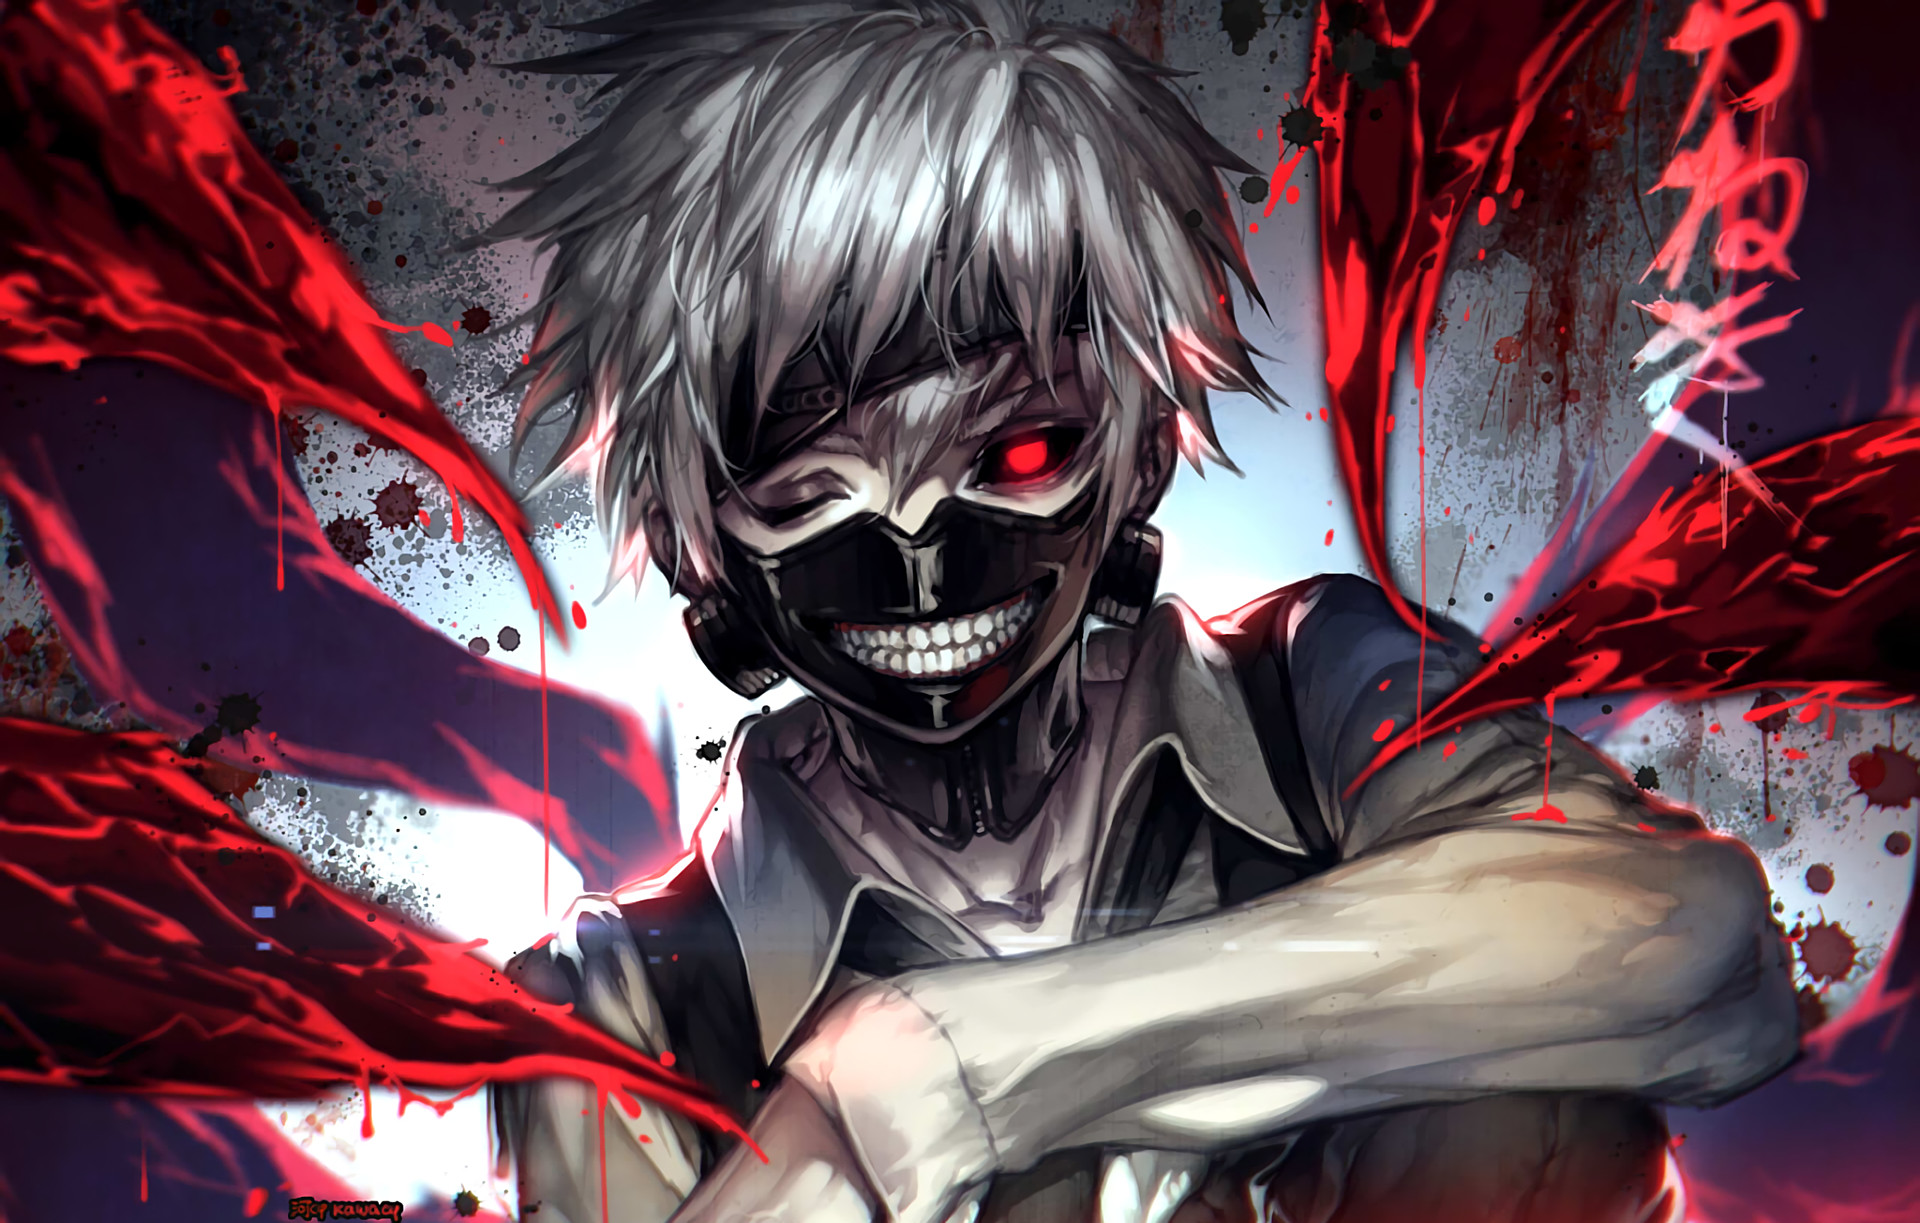 Anime Tokyo Ghoul Touka Kirishima · HD Wallpaper | Background ID:541200